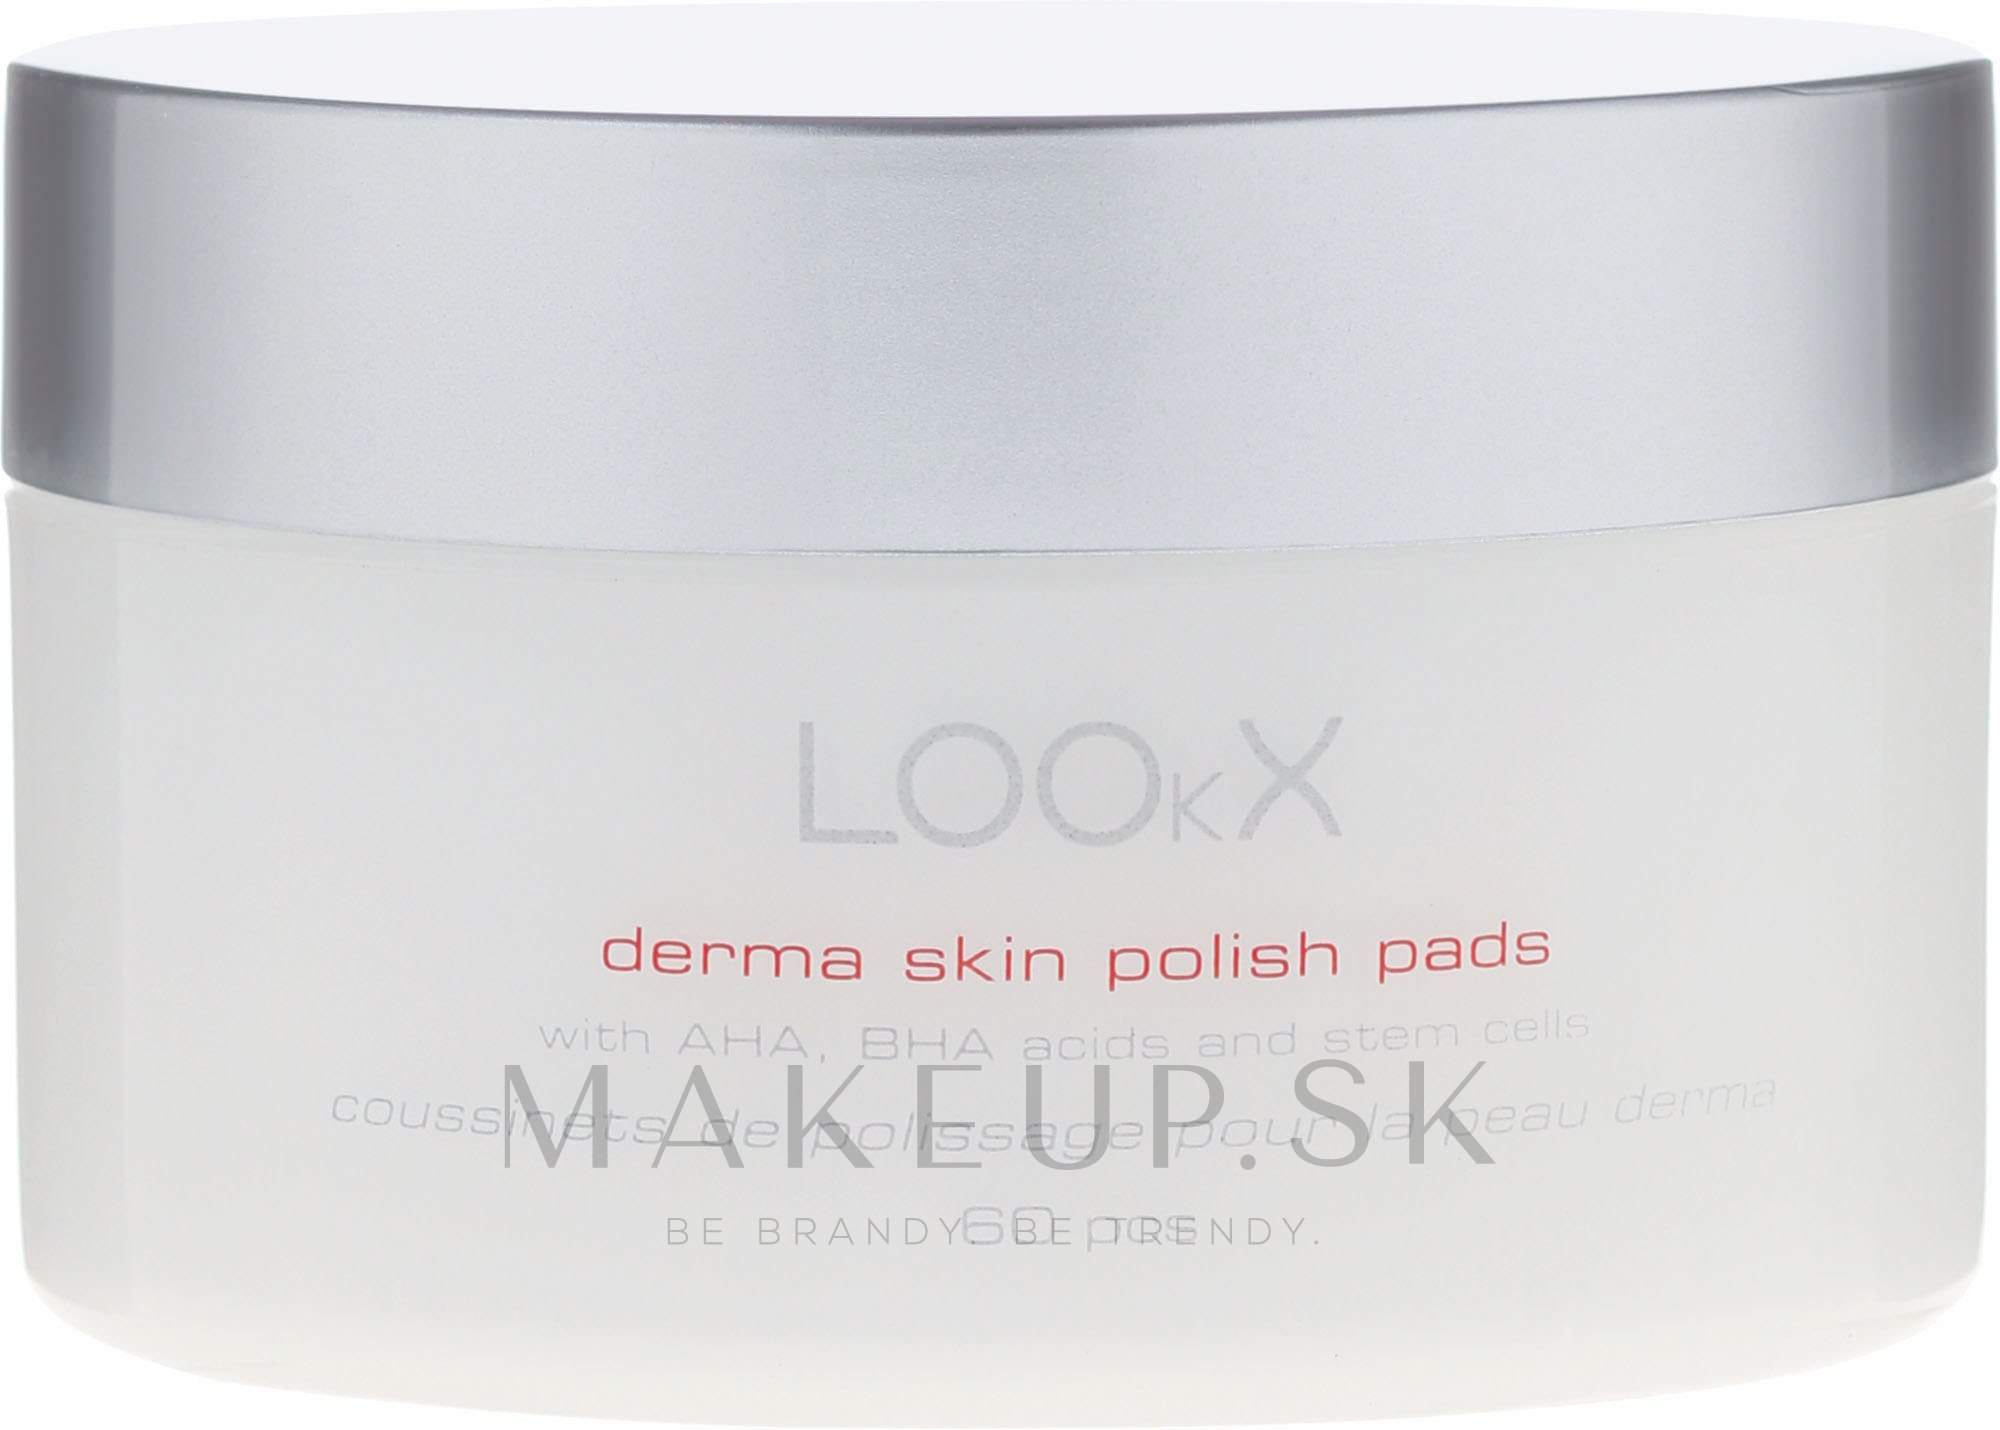 Vankúšiky na pokožku s AHA, BHA kyselinami - LOOkX Derma Skin Polish Pads — Obrázky 60 ks.